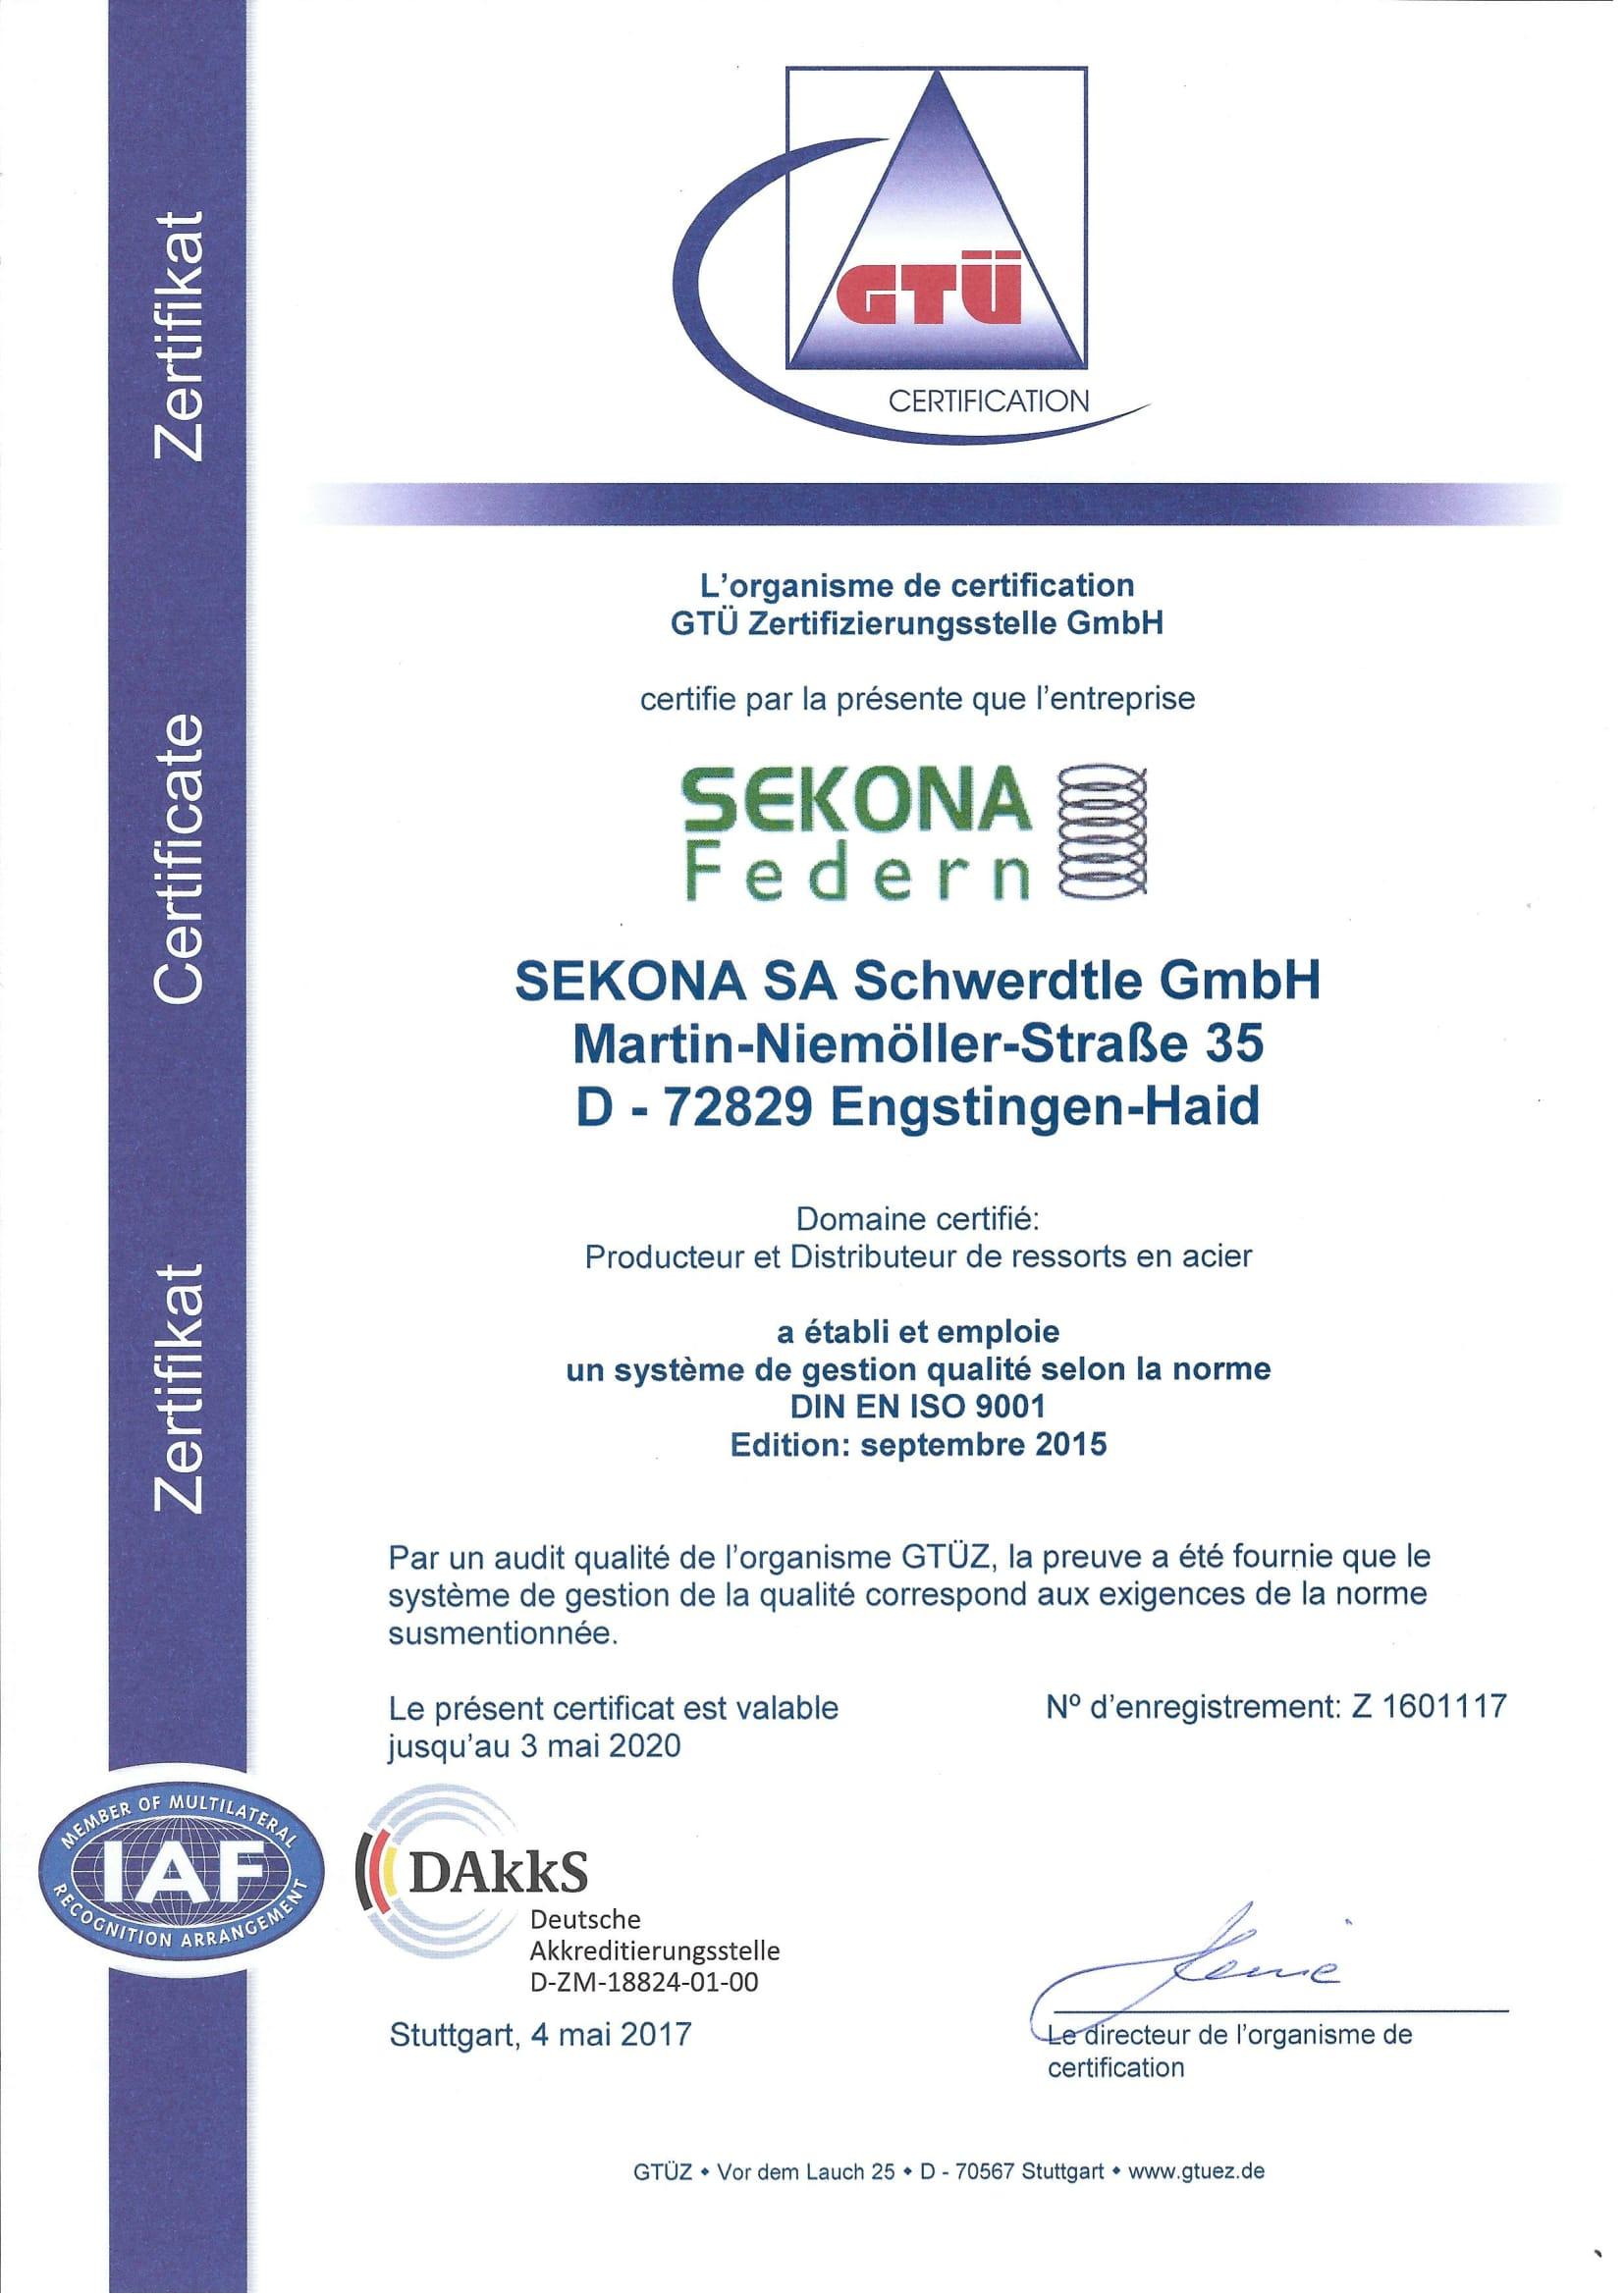 DIN EN ISO 9001 Zertifikat Französisch